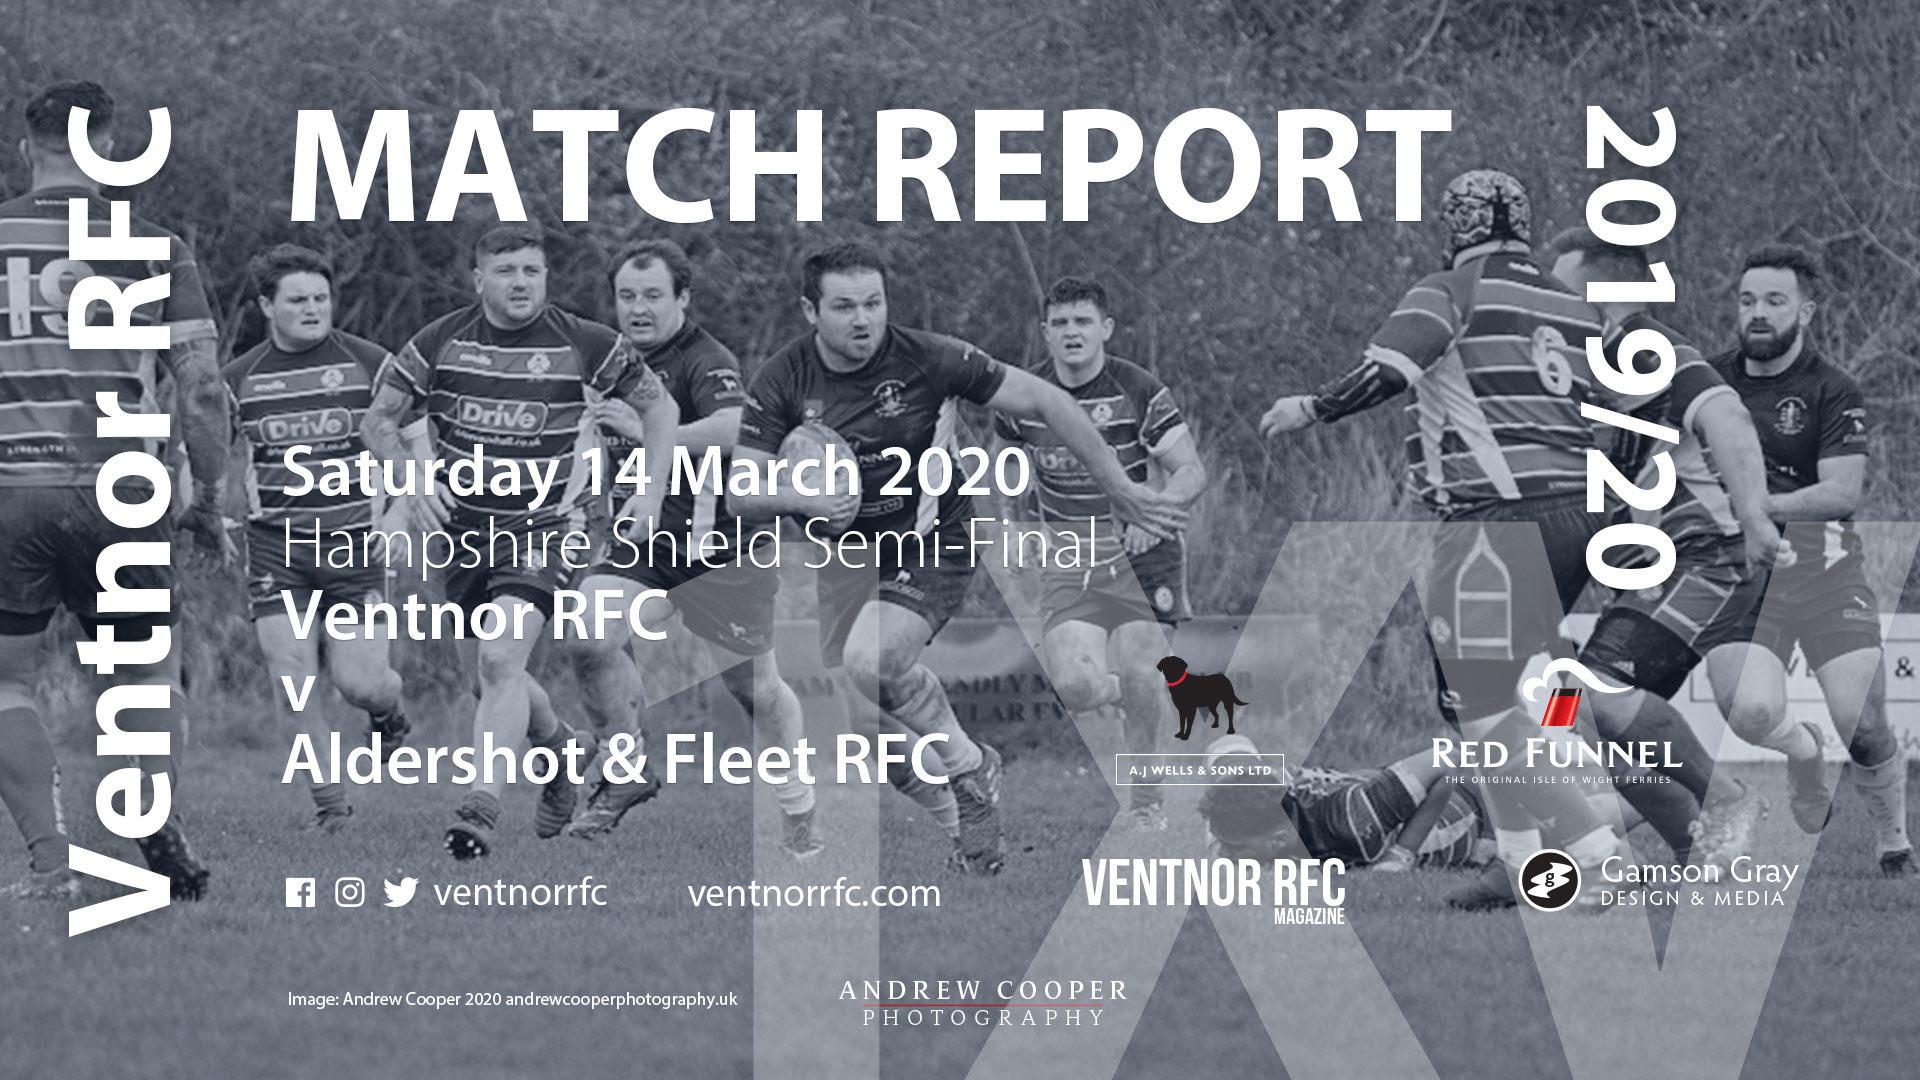 Ventnor-RFC-1XV-33-34-Aldershot-and-Fleet-RFC-14-March-2020-match-report-hampshire-shield-semi-final